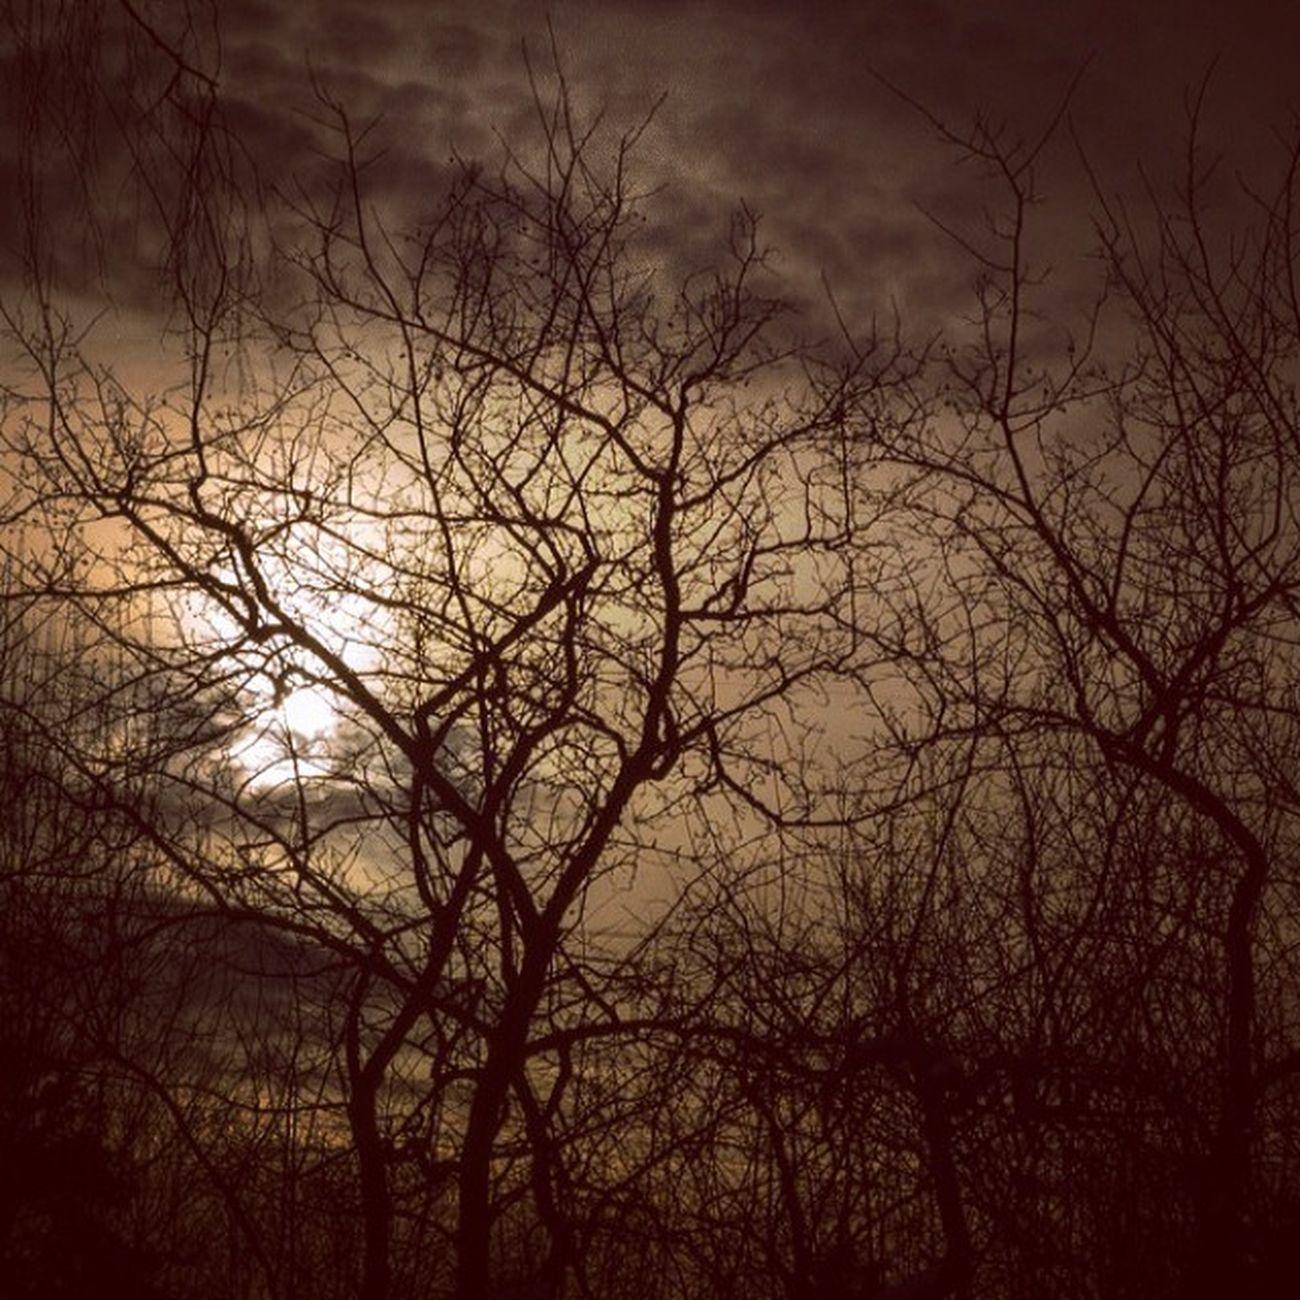 Karanlik bir saat basliyor ansizin, sensiz, sessiz... Yalnizlik yine ayni, yine isimsiz ve yine ben gibi... Pofffffff Kendimenot Fotograf dark darkness sunset gunbatimi manzara nature istanbul gokyuzu sky